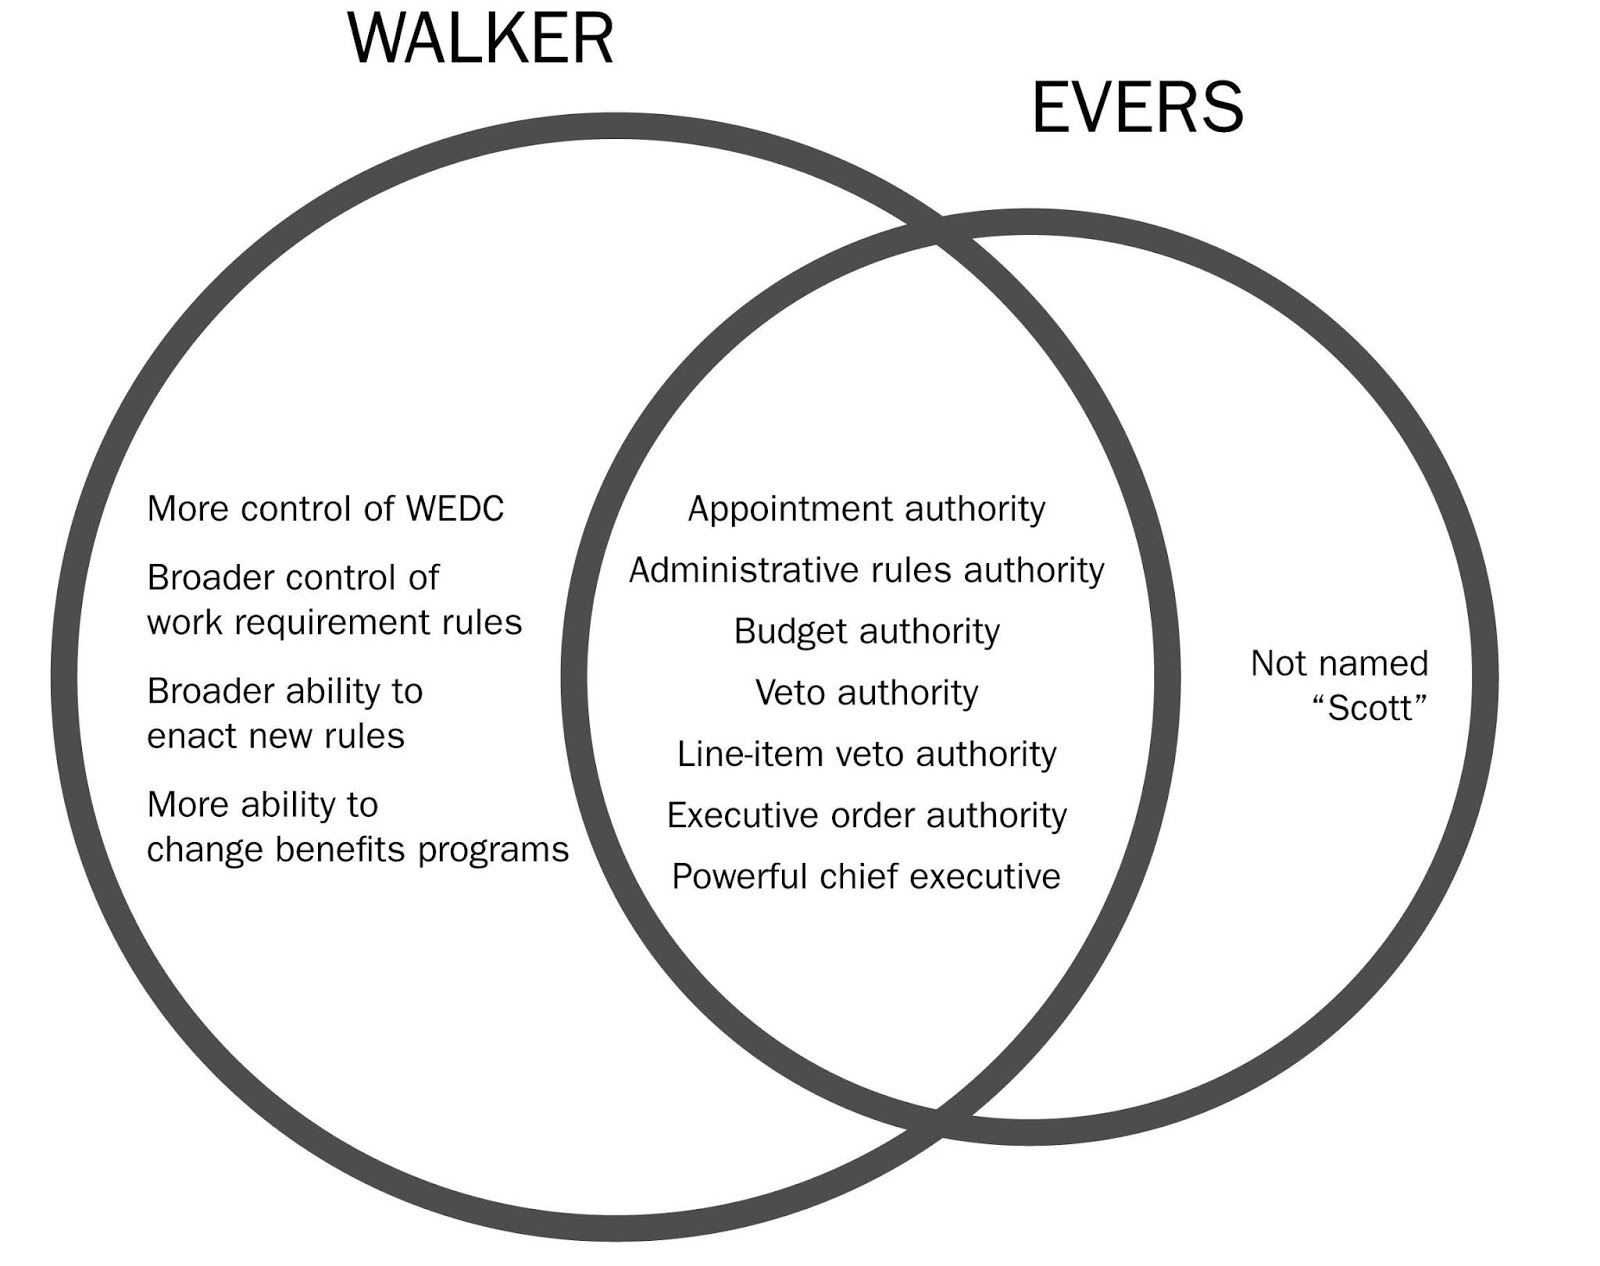 Democurmudgeon  Add Walker U0026 39 S Wacky Venn Diagram To His